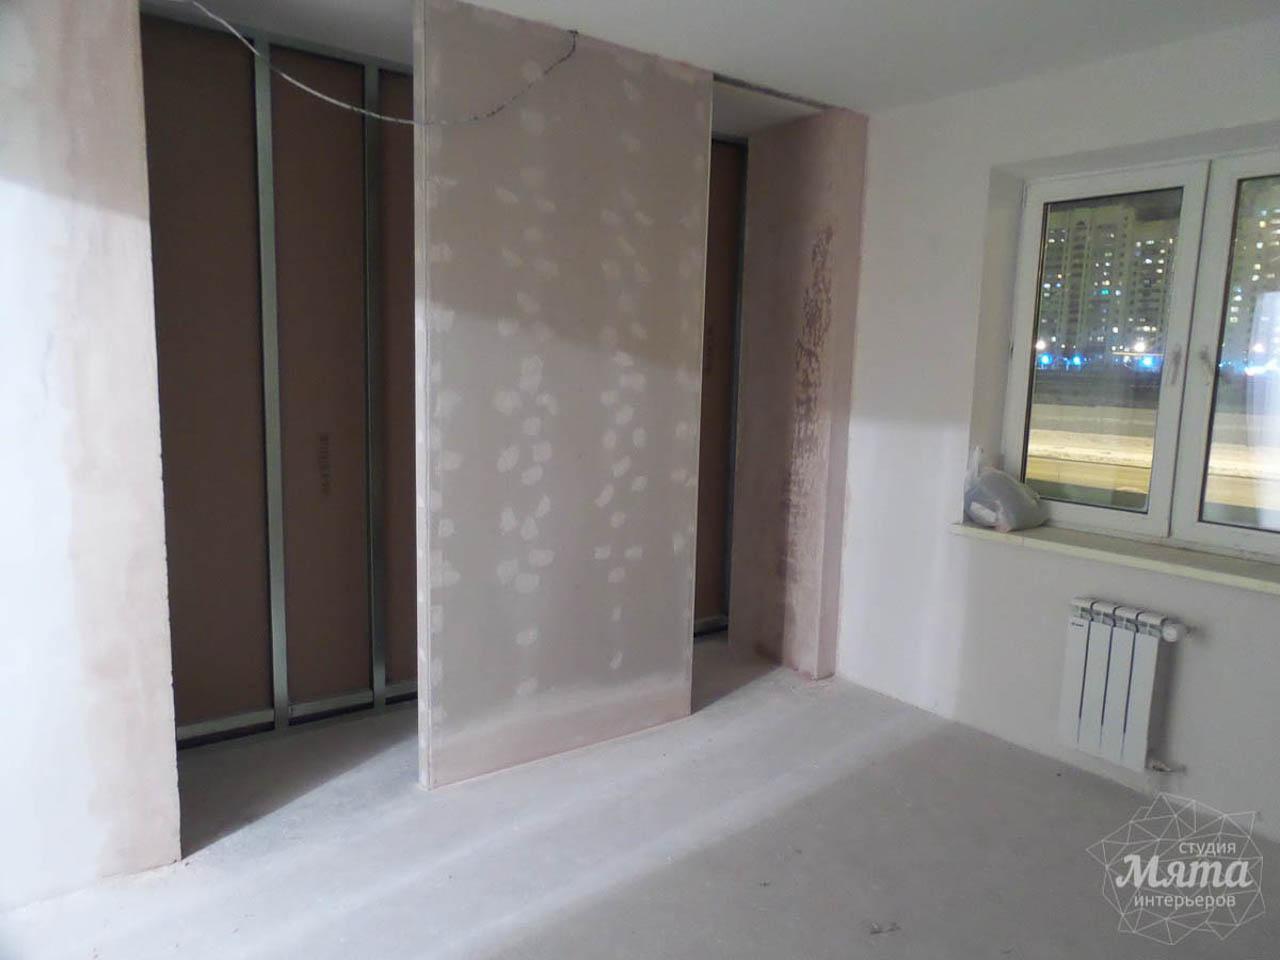 Дизайн интерьера и ремонт трехкомнатной квартиры по ул. Фучика 9 4